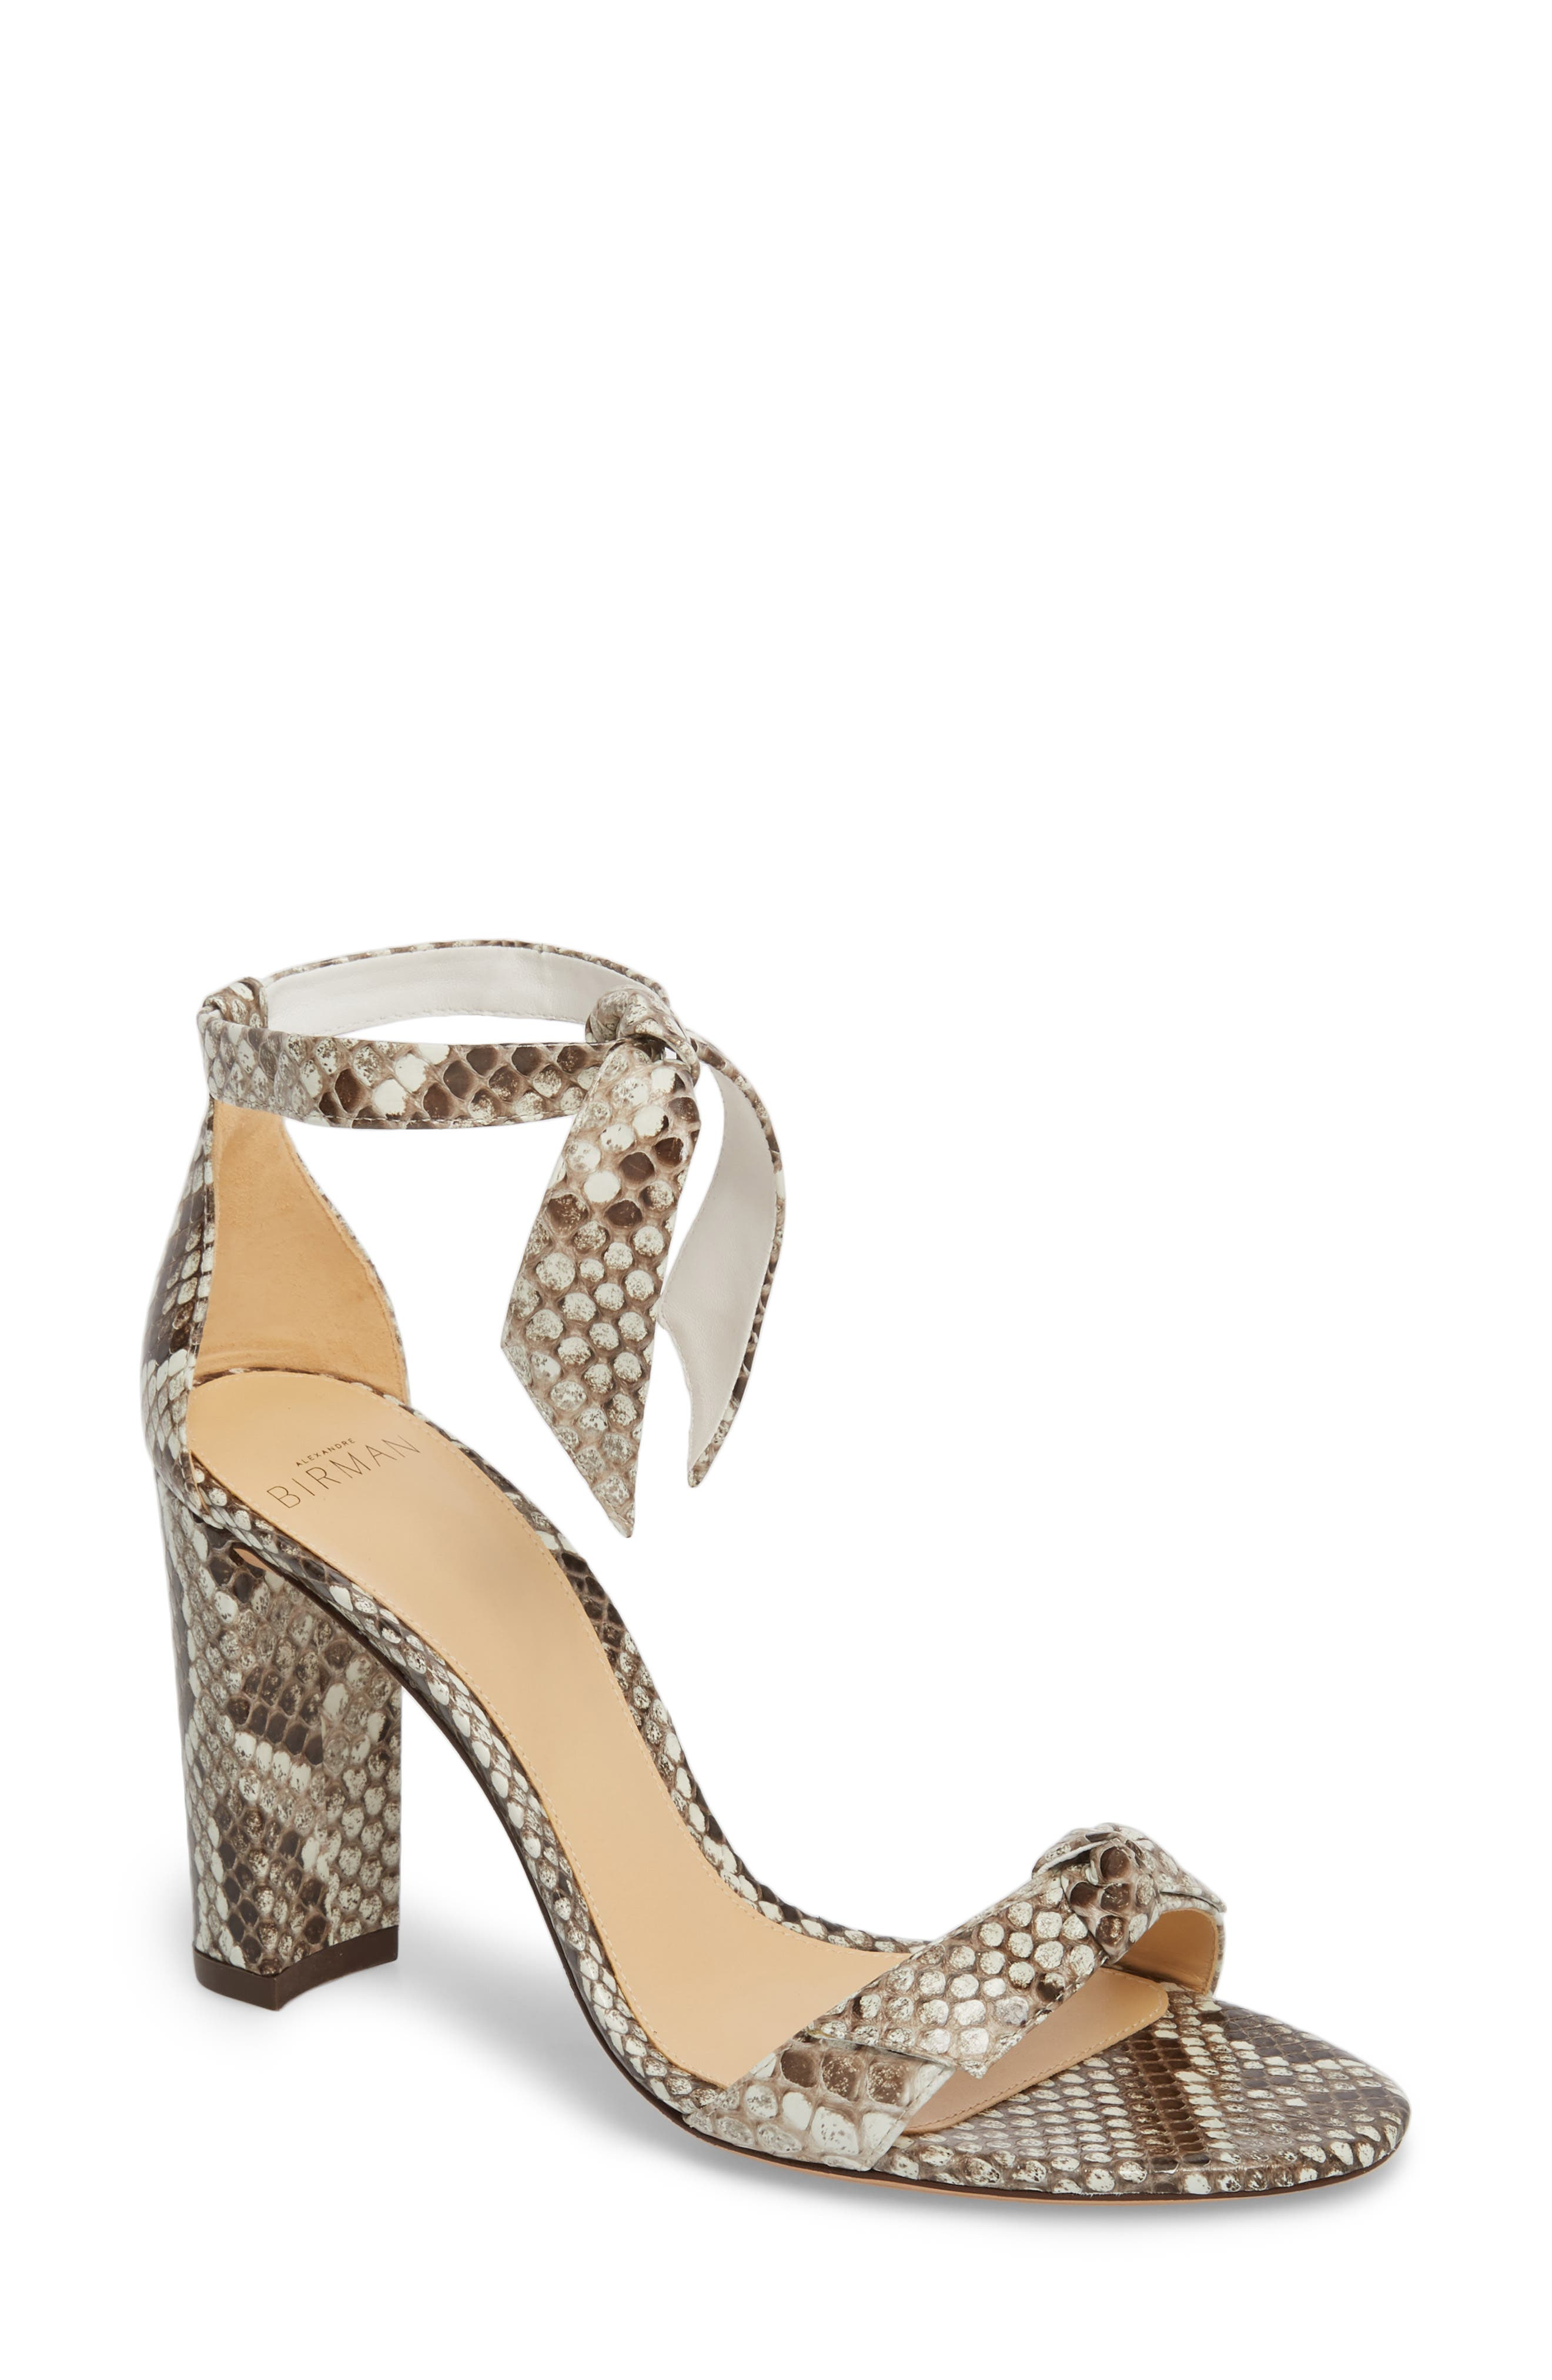 Clarita Genuine Python Ankle Tie Sandal,                         Main,                         color, 250